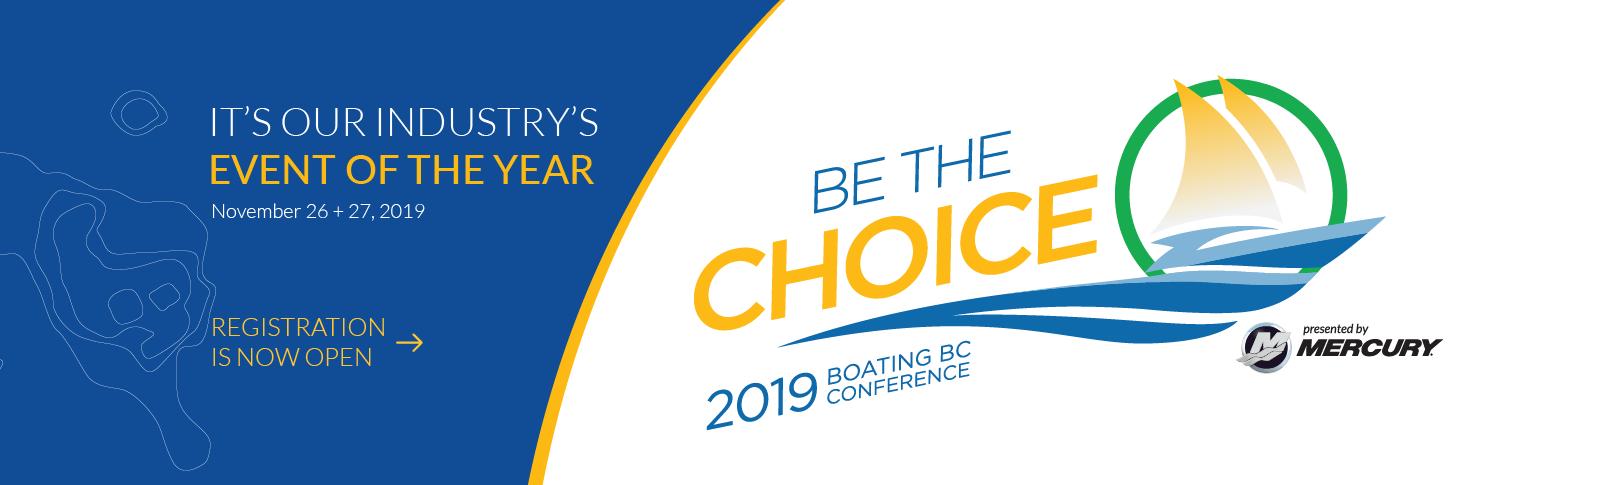 2019 Boating BC Conference, Boating Conference, Boating in BC